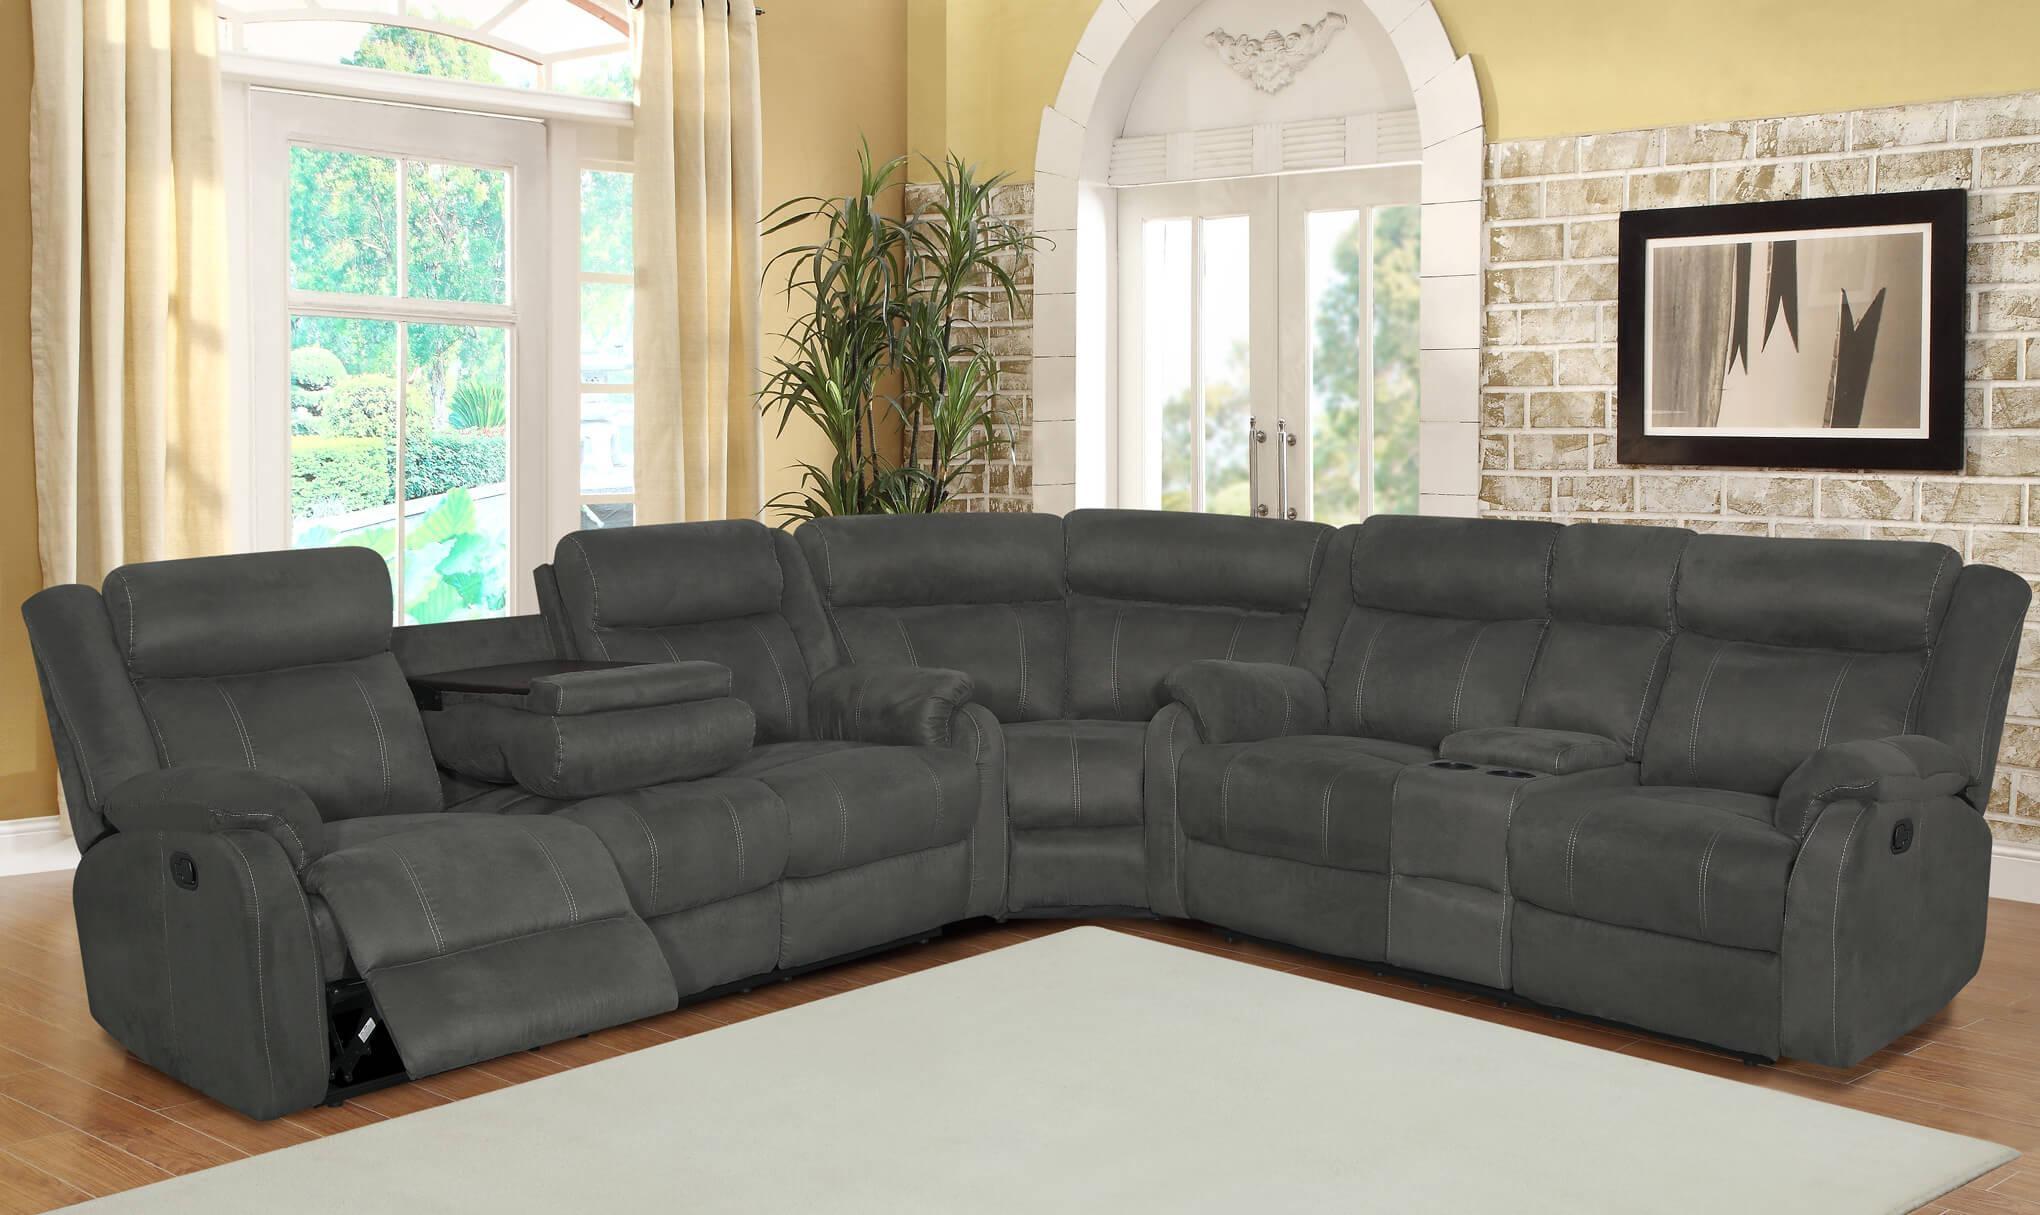 Sofas Center : Sofas Center Grey Leatherining Sofa Setgray Gray For Charcoal Grey Sofas (Image 20 of 20)